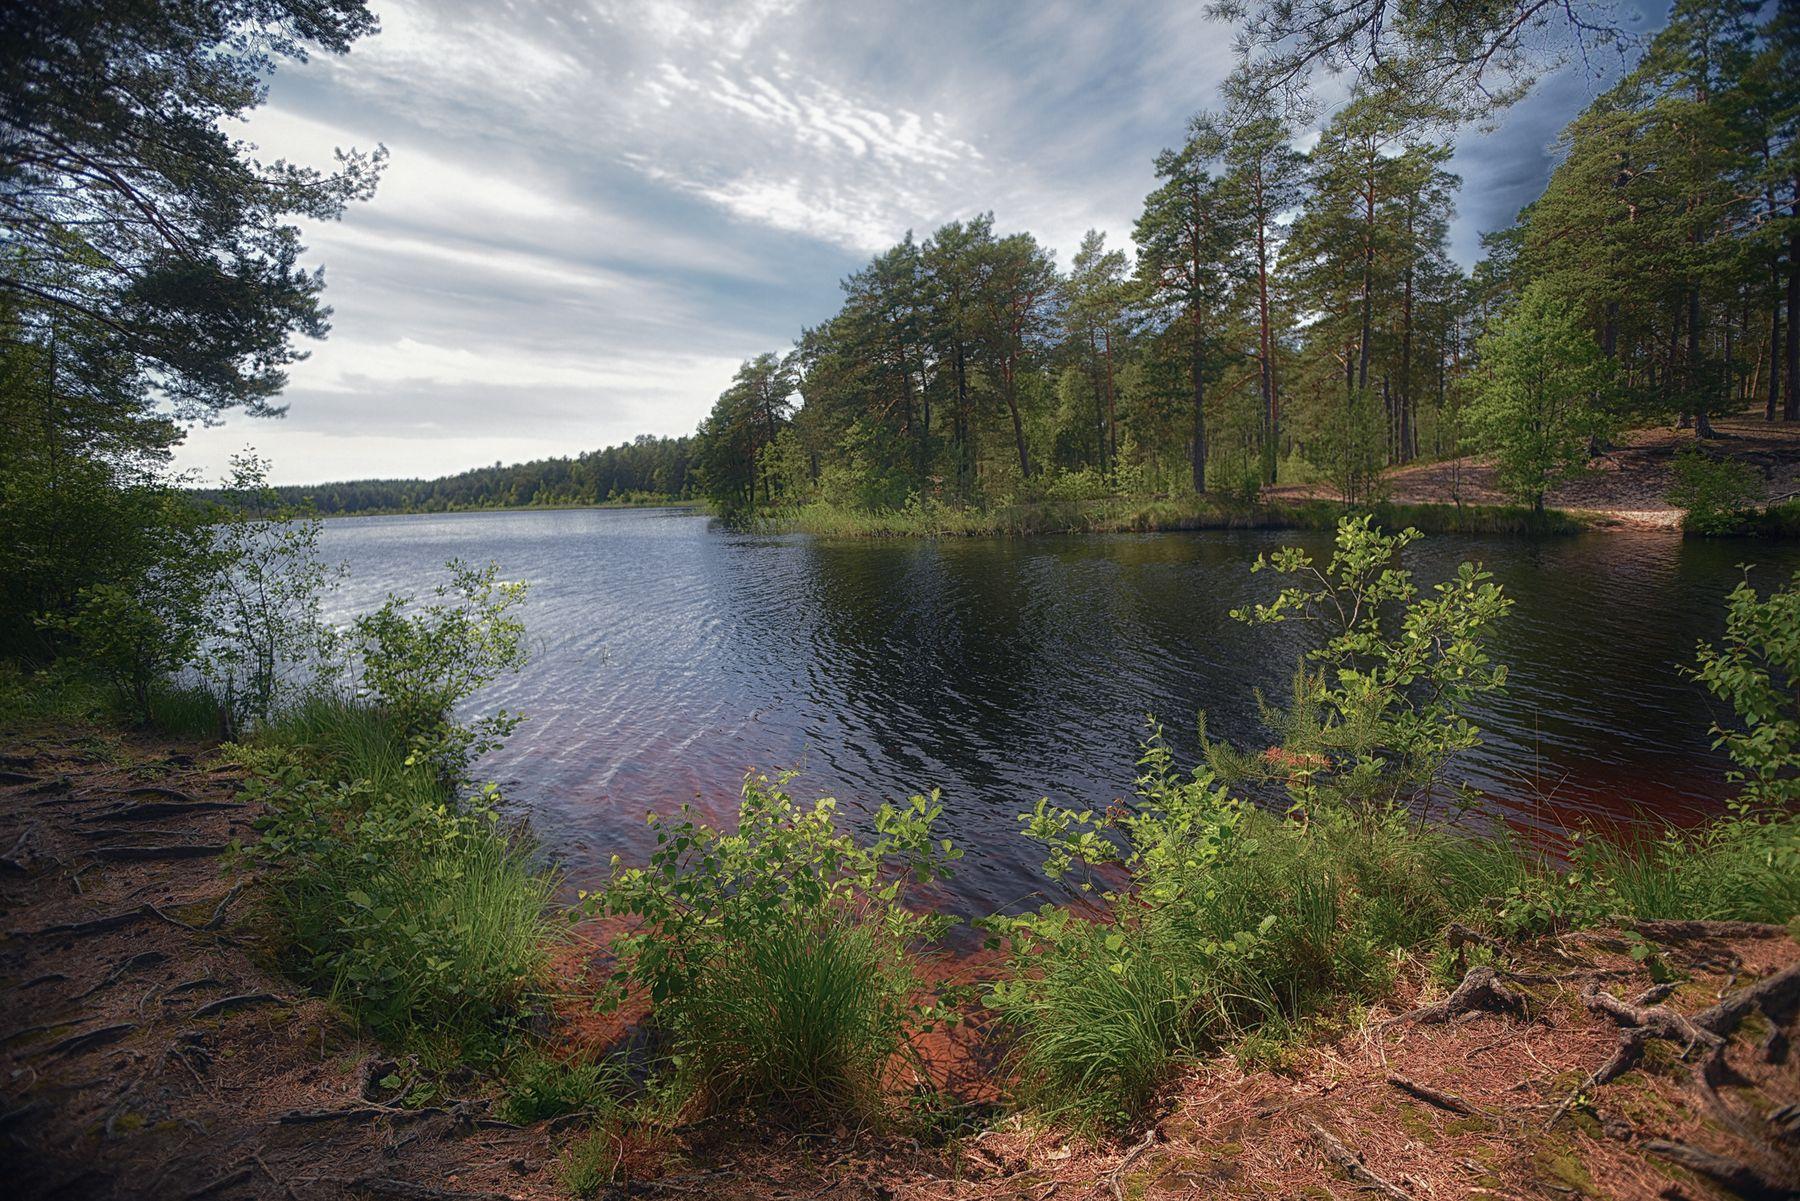 * озеро лес природа лето красота eVm